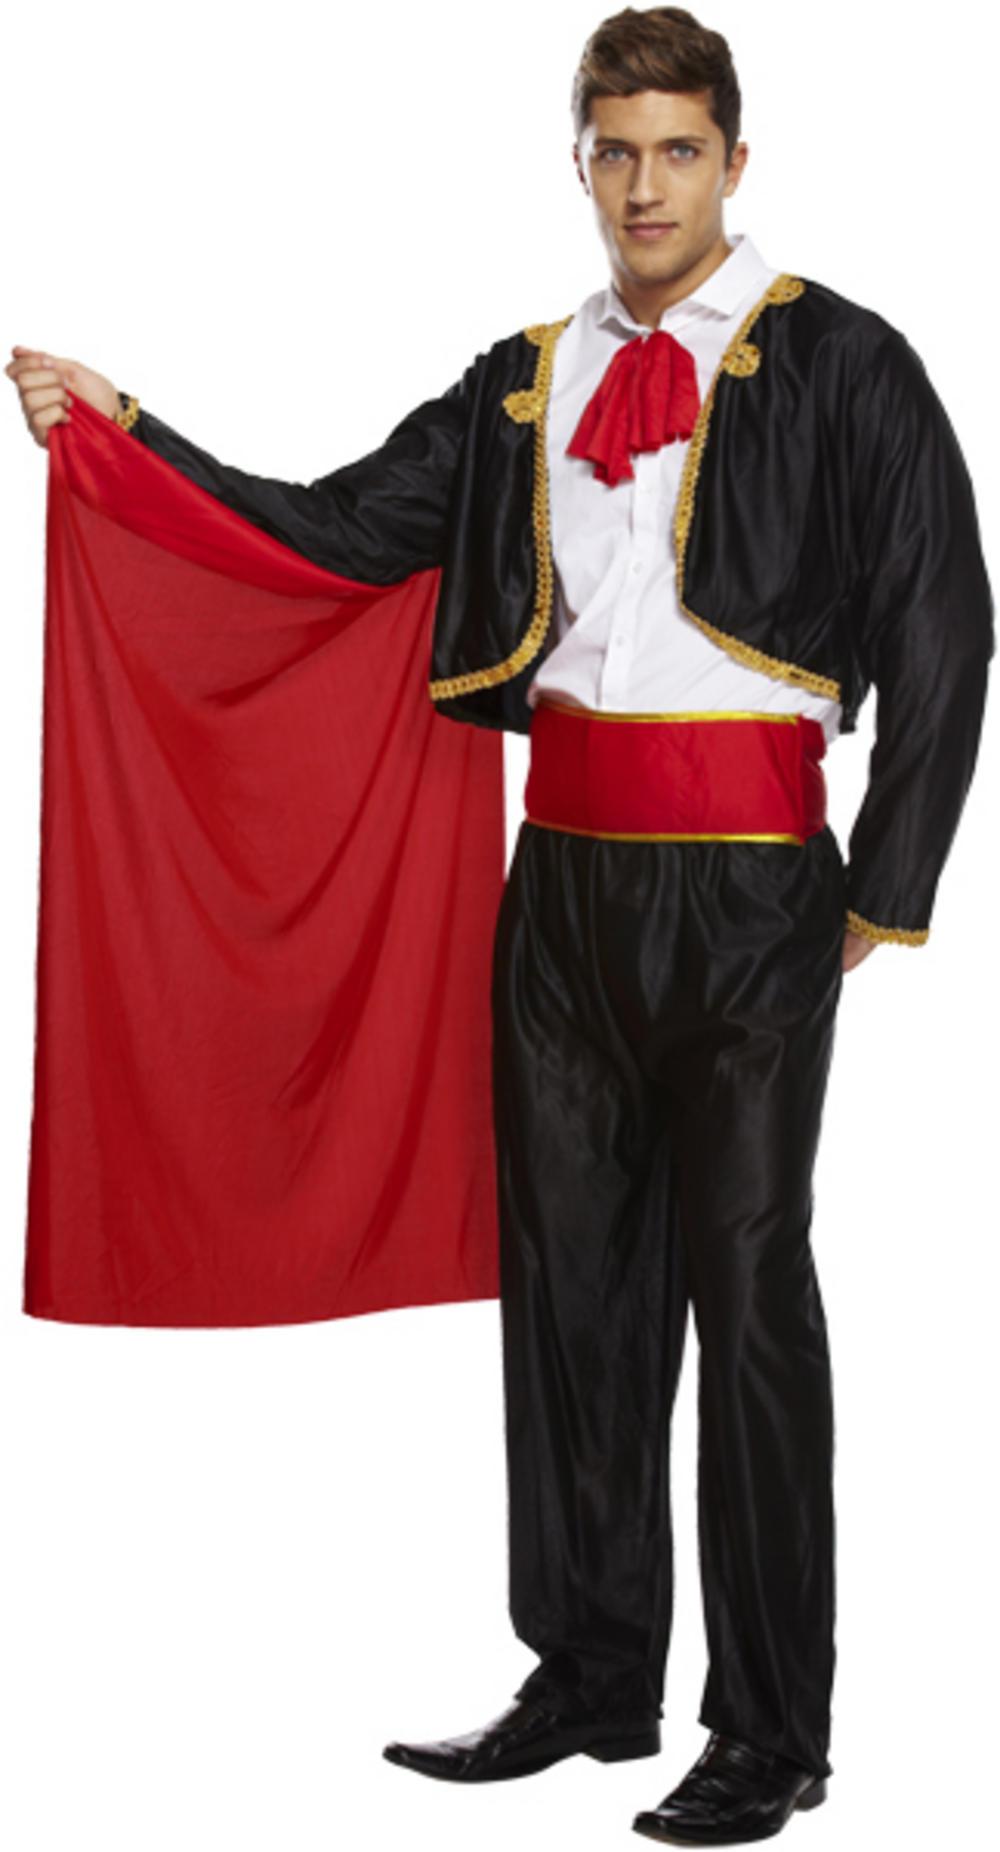 09a6ed83b Spanish Matador Costume